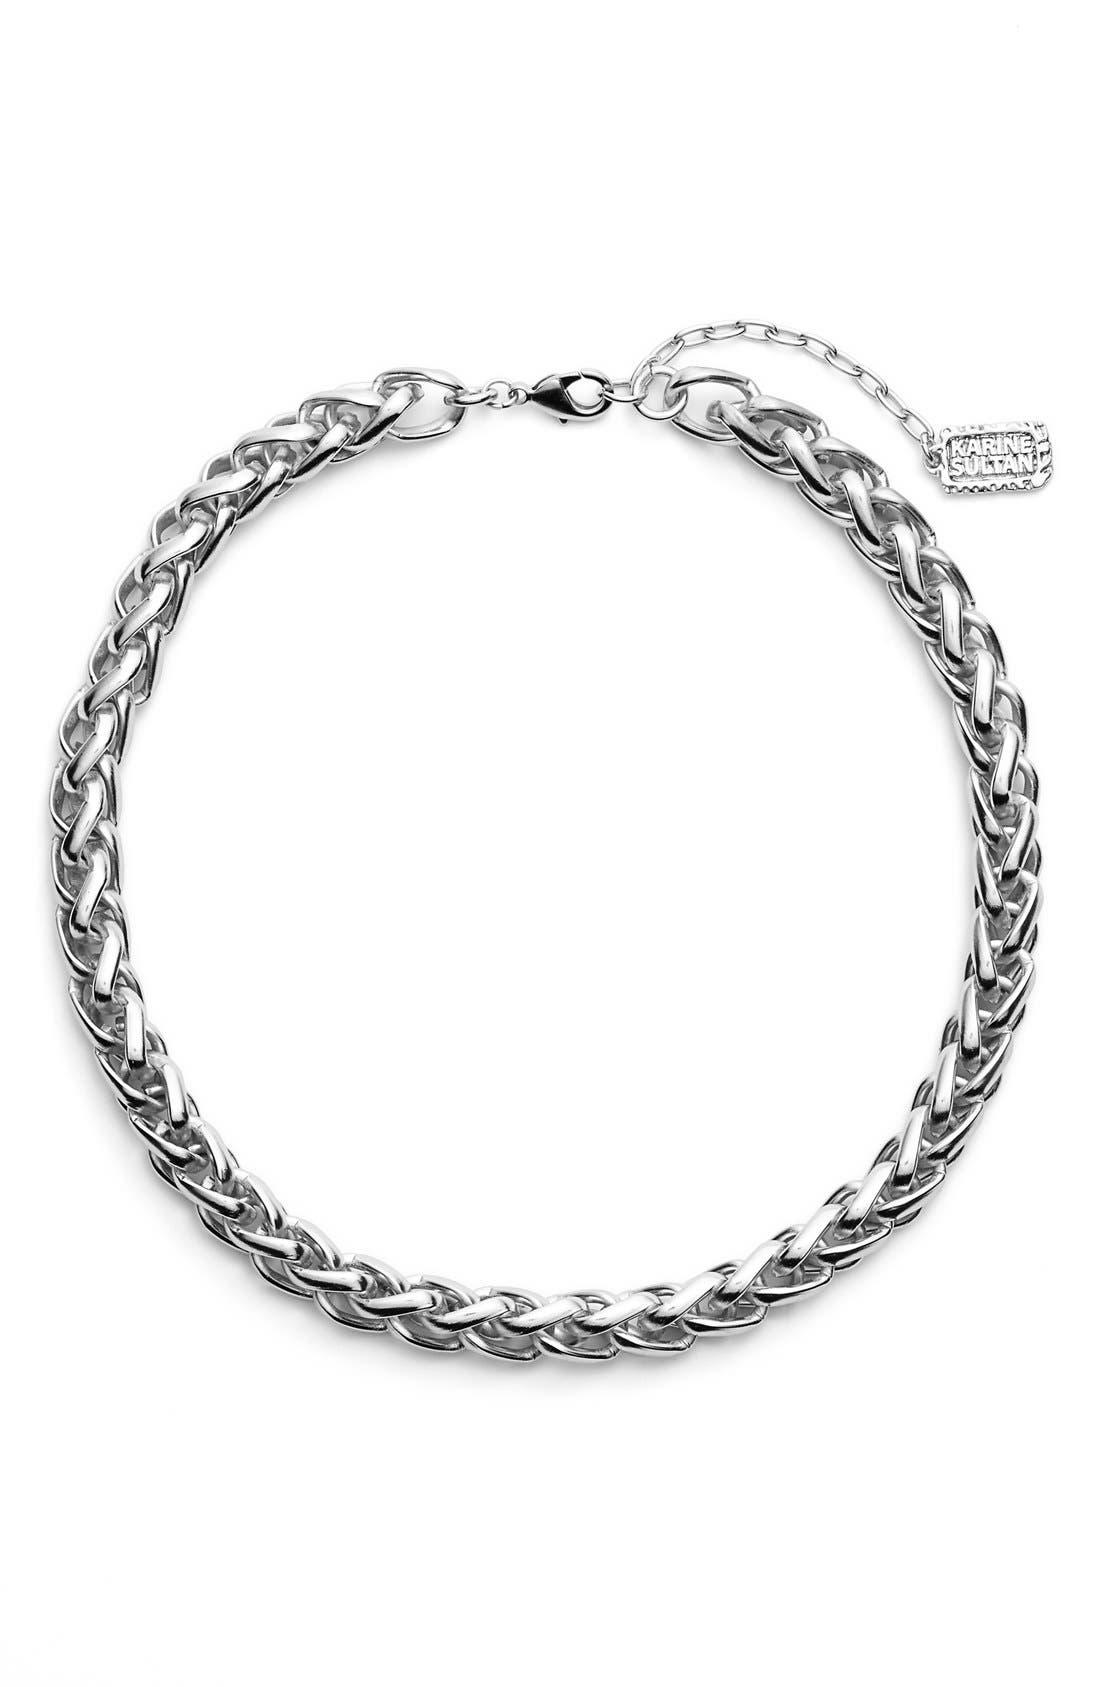 Main Image - Karine Sultan Braided Link Collar Necklace